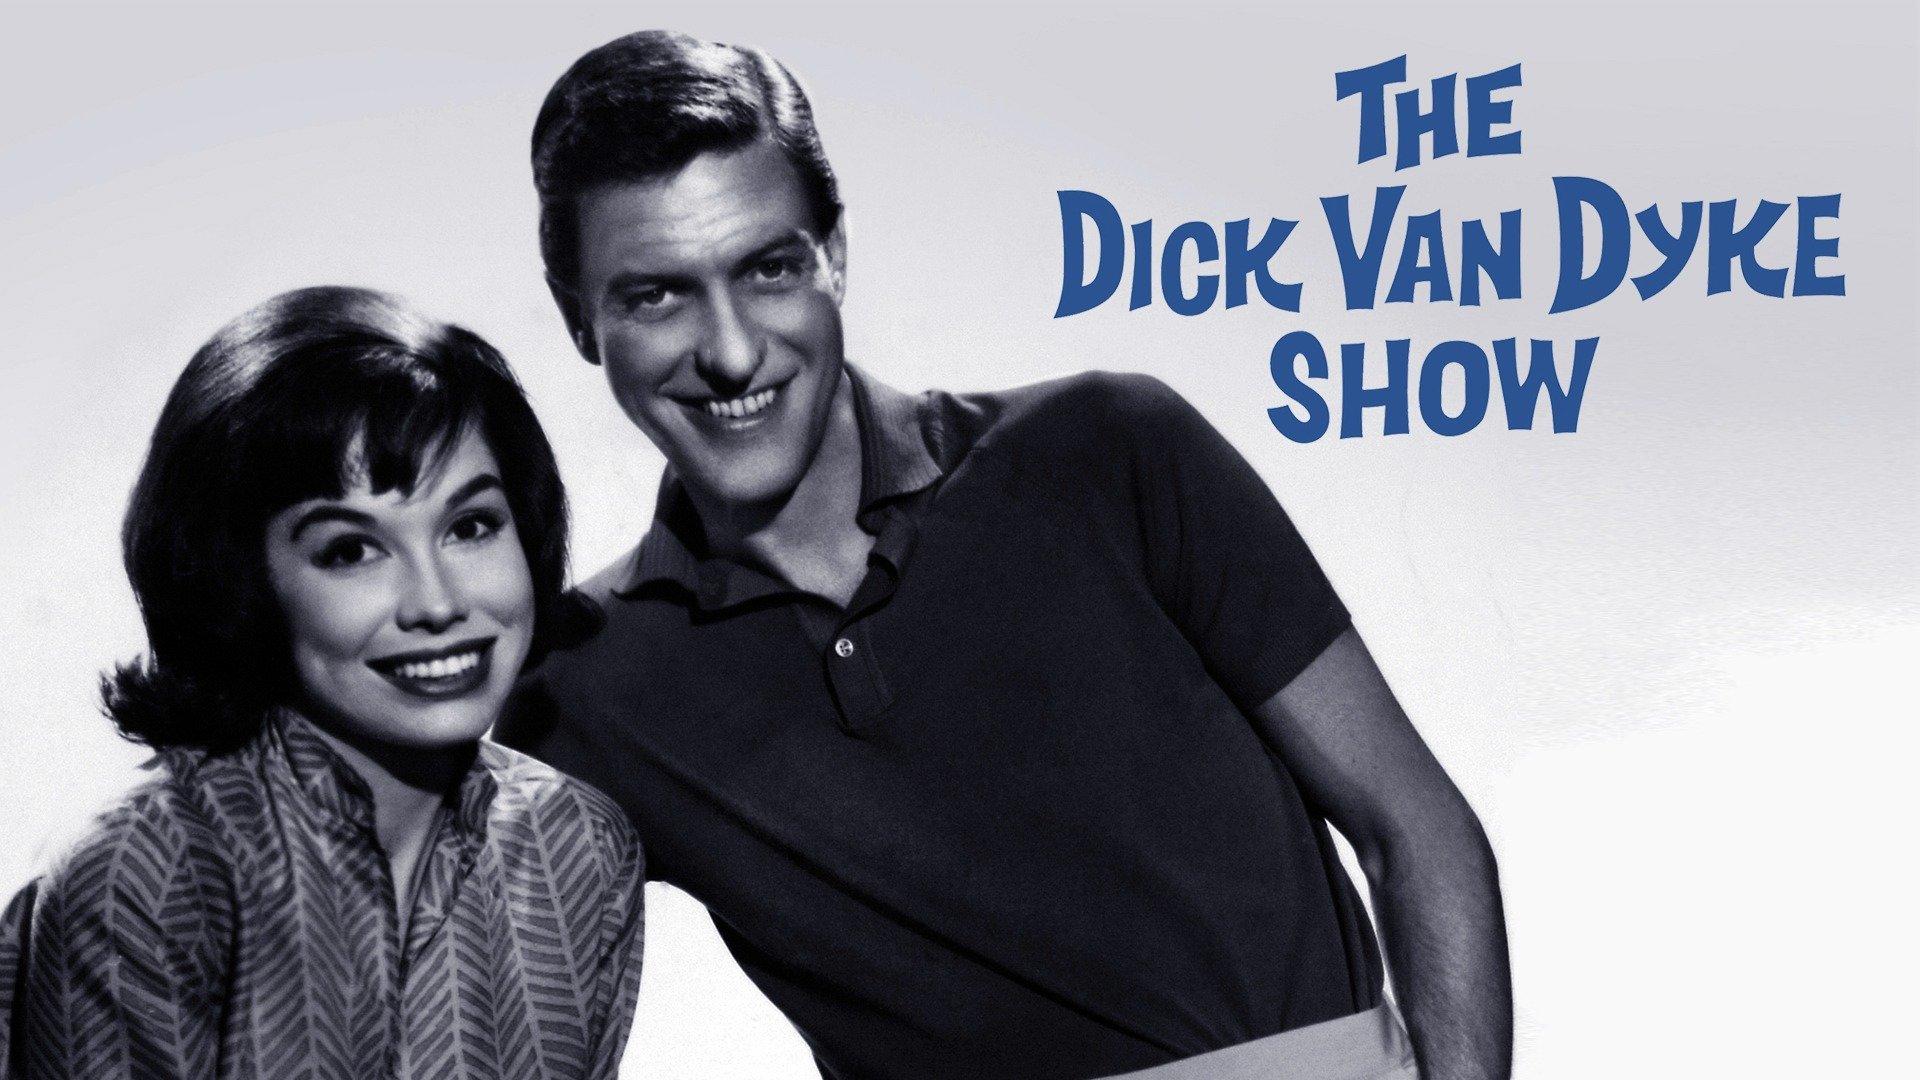 The Dick Van Dyke Show - CBS